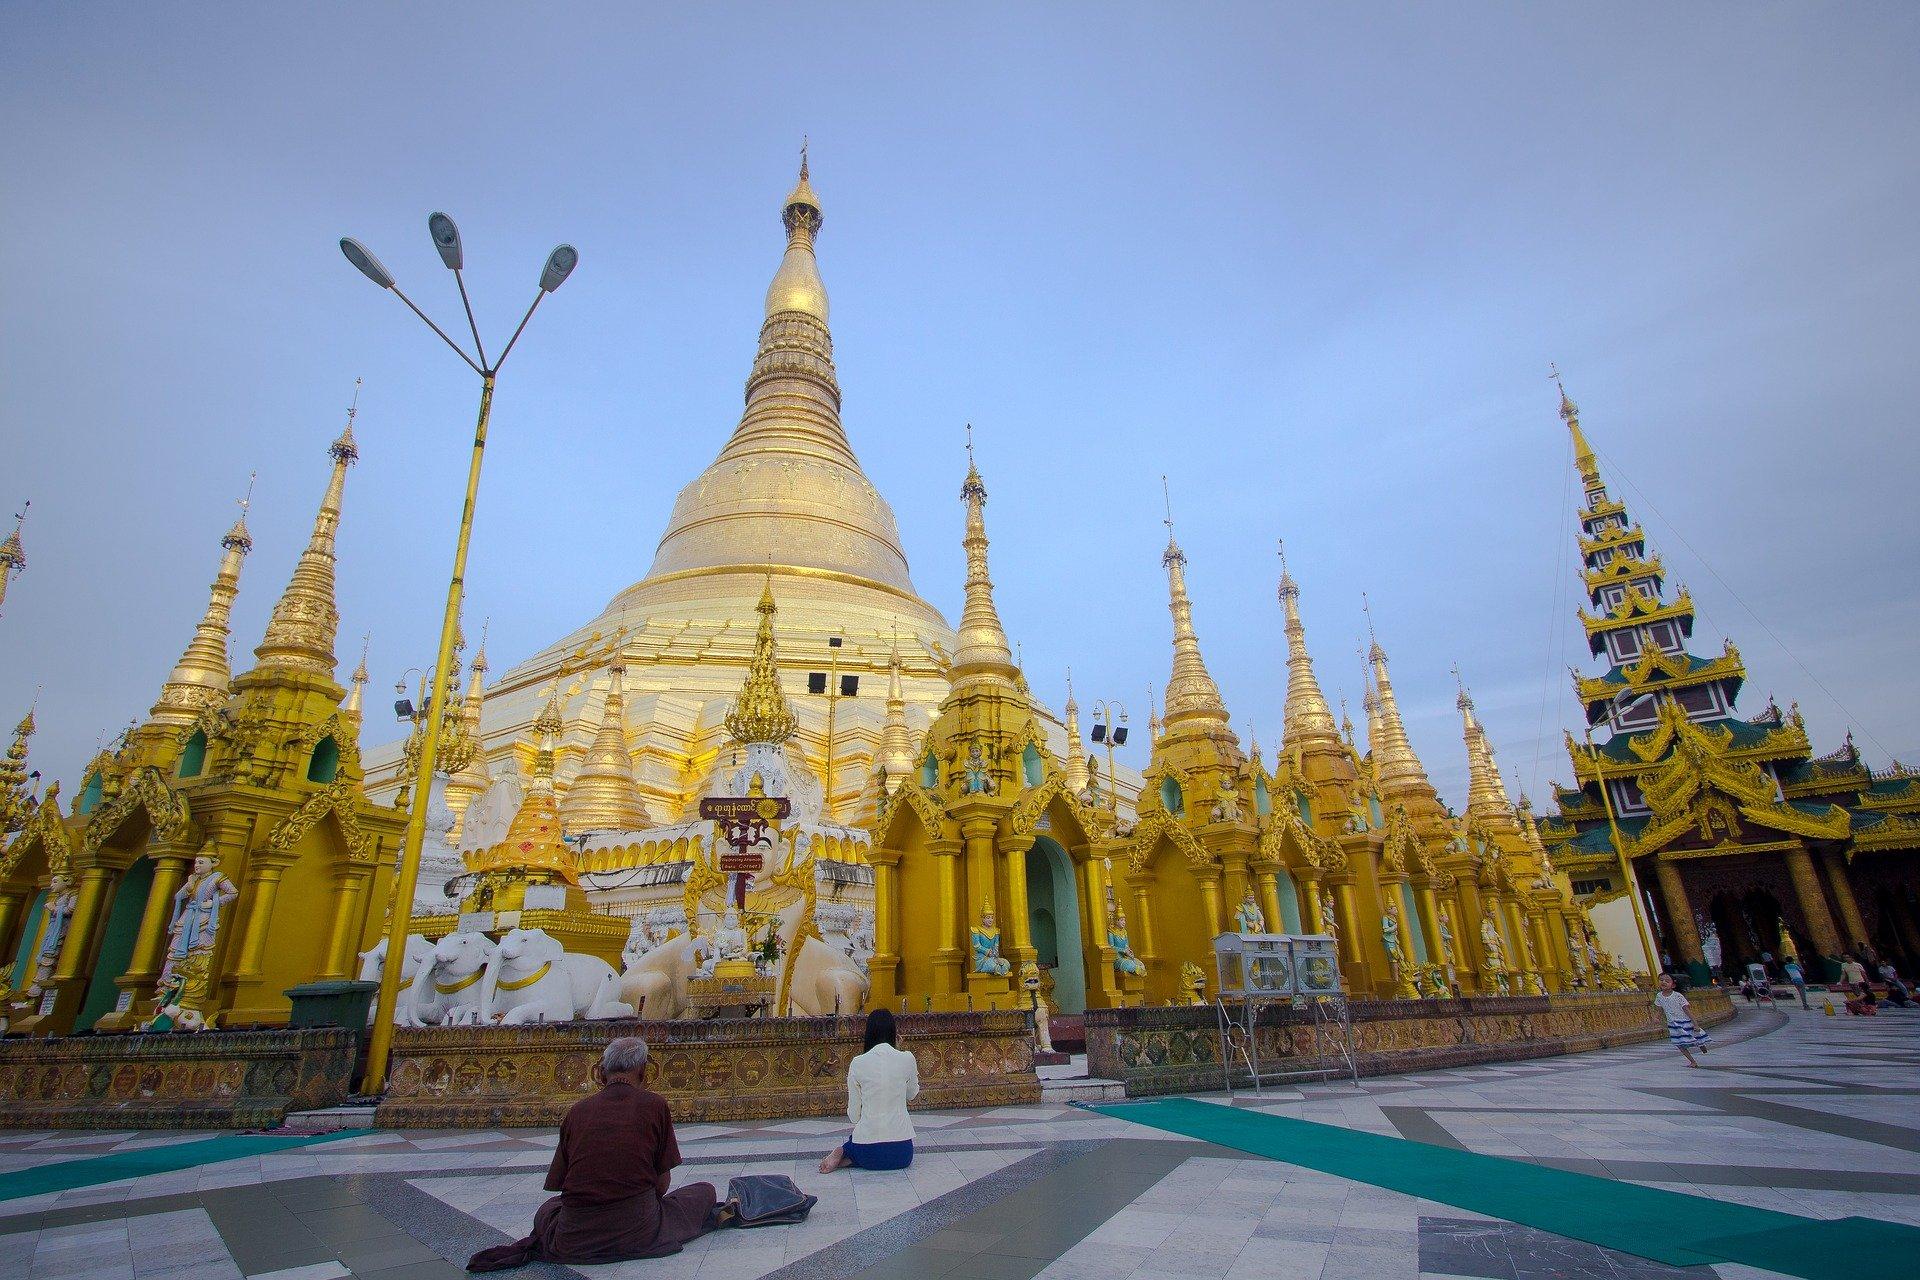 The main stupa at Shwedagon Pagoda